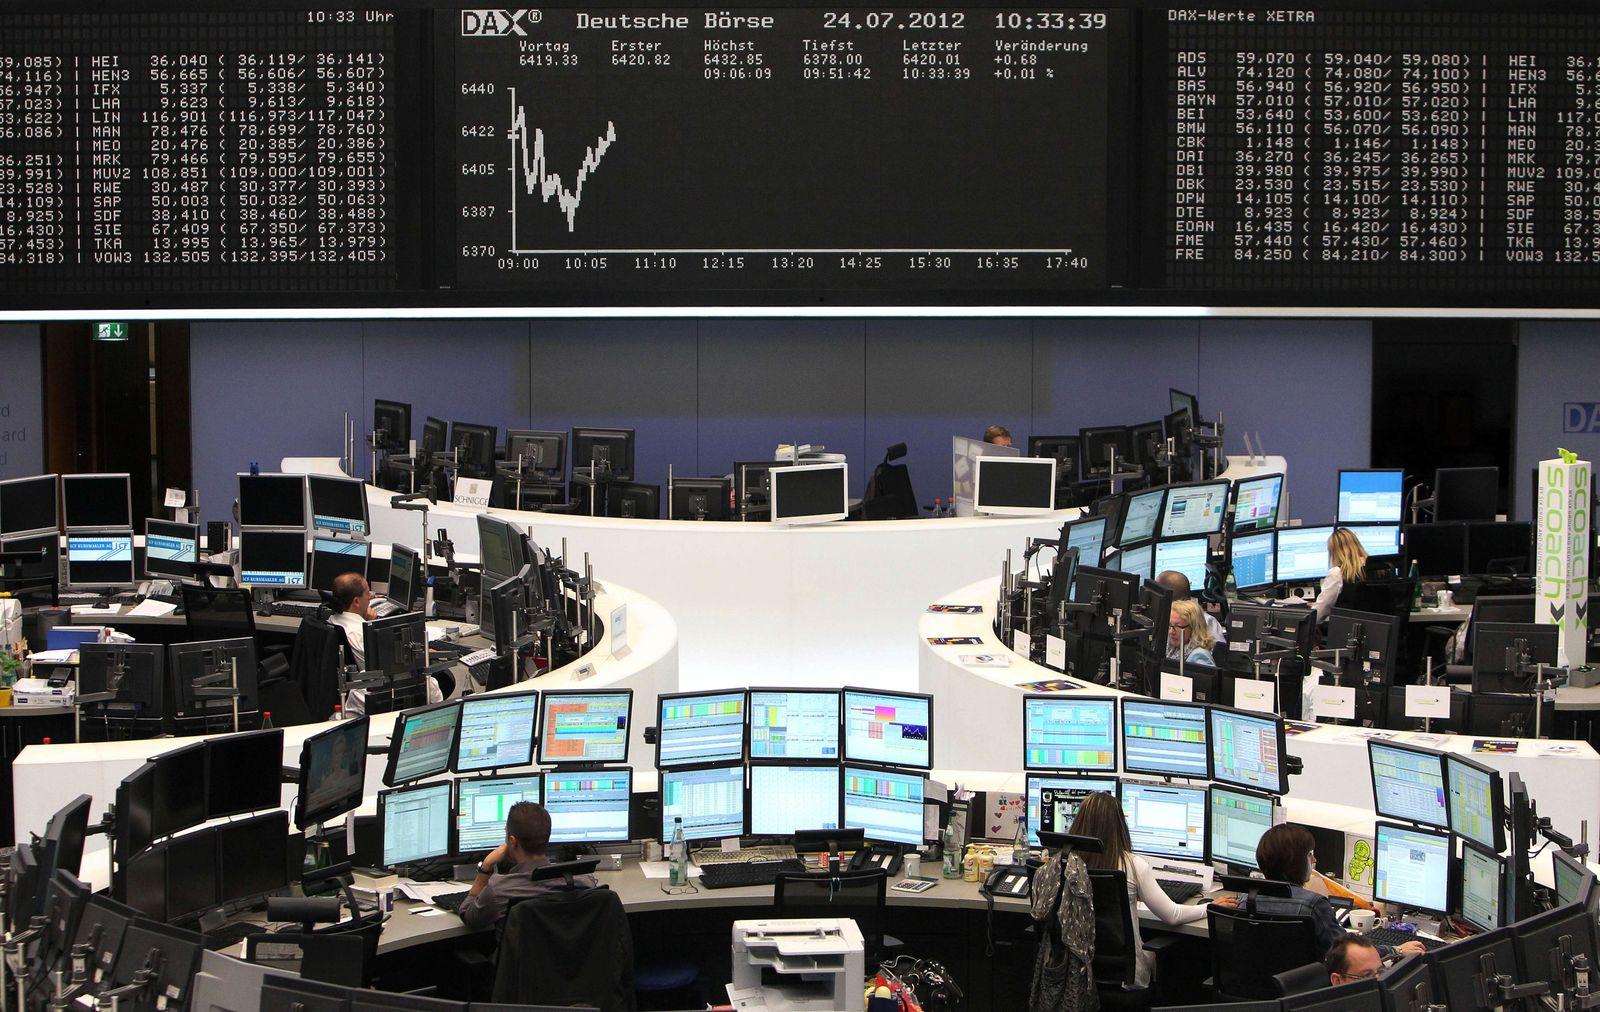 GERMANY-FINANCE-PUBLIC-DEBT-EUROZONE-RATINGS